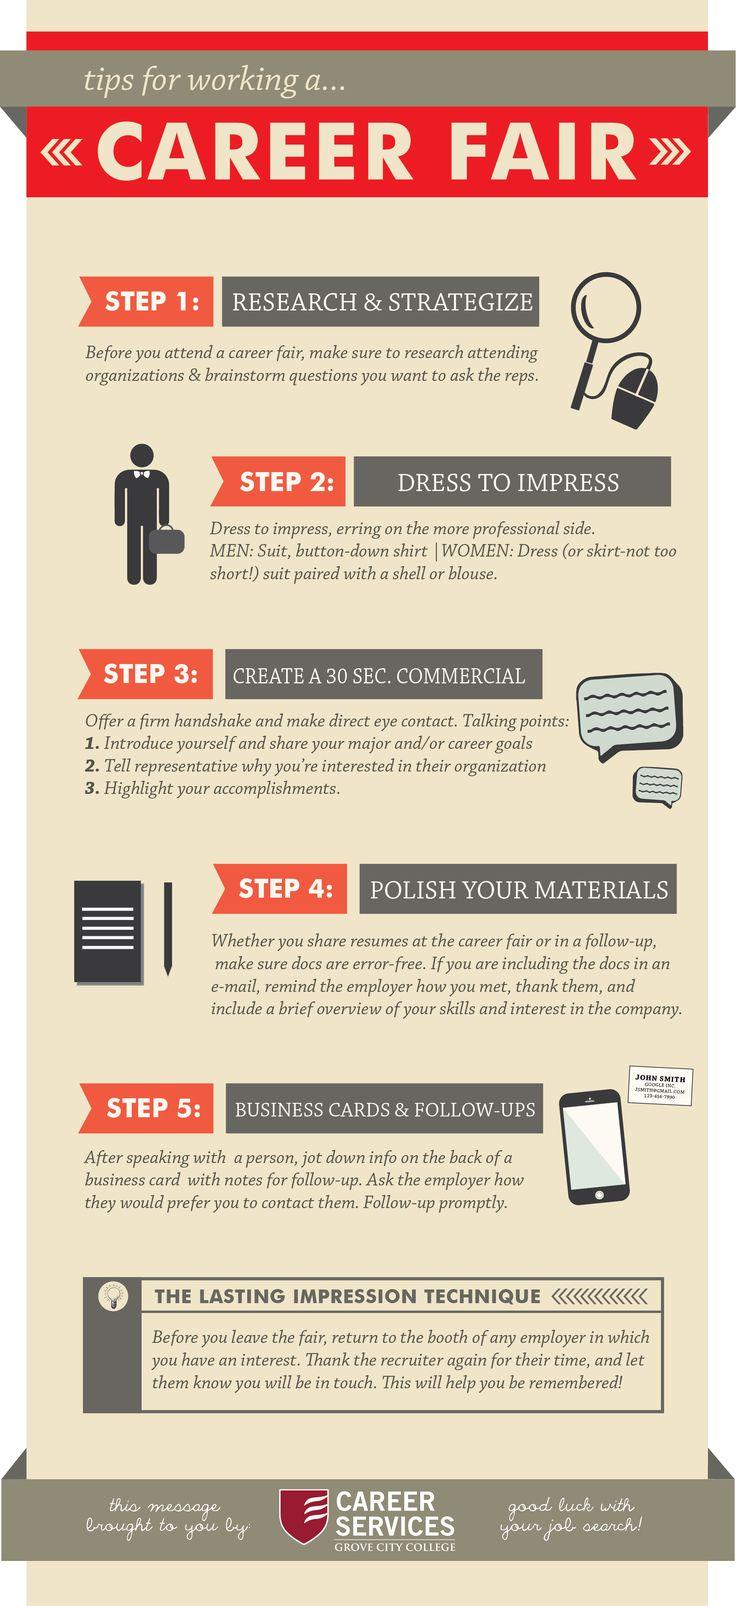 53 Best Career Fair Tips Images On Pinterest Career Fair Tips